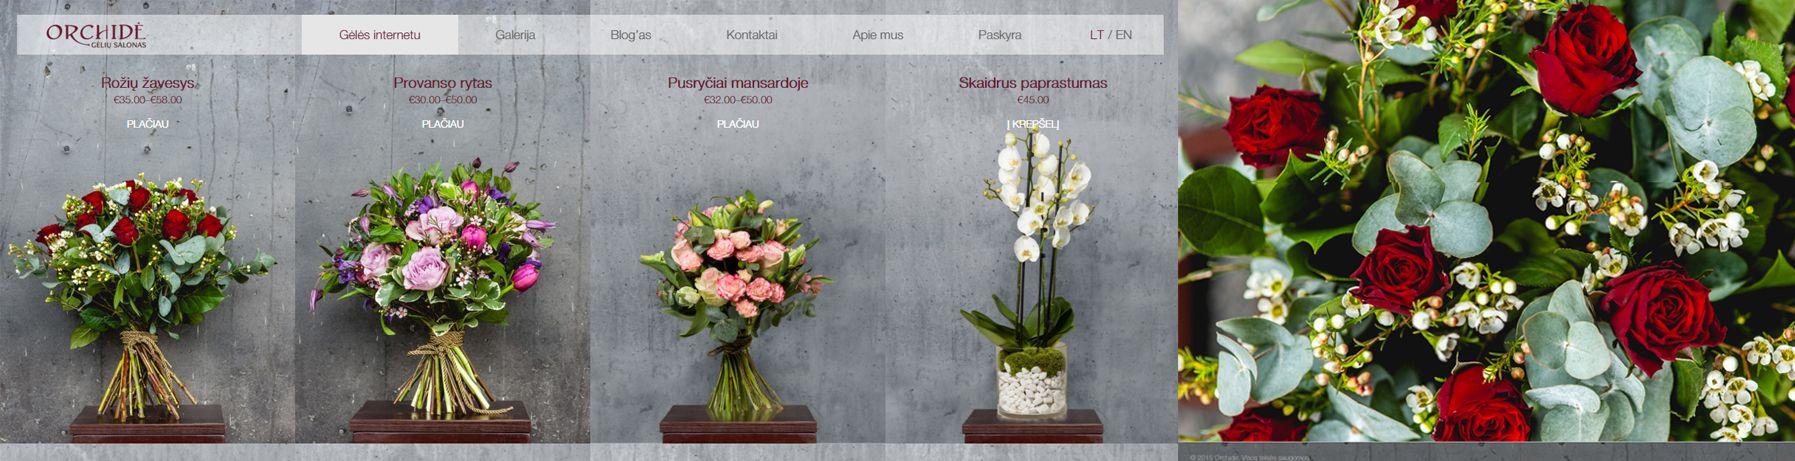 El. parduotuviu kurimas, orchide.lt